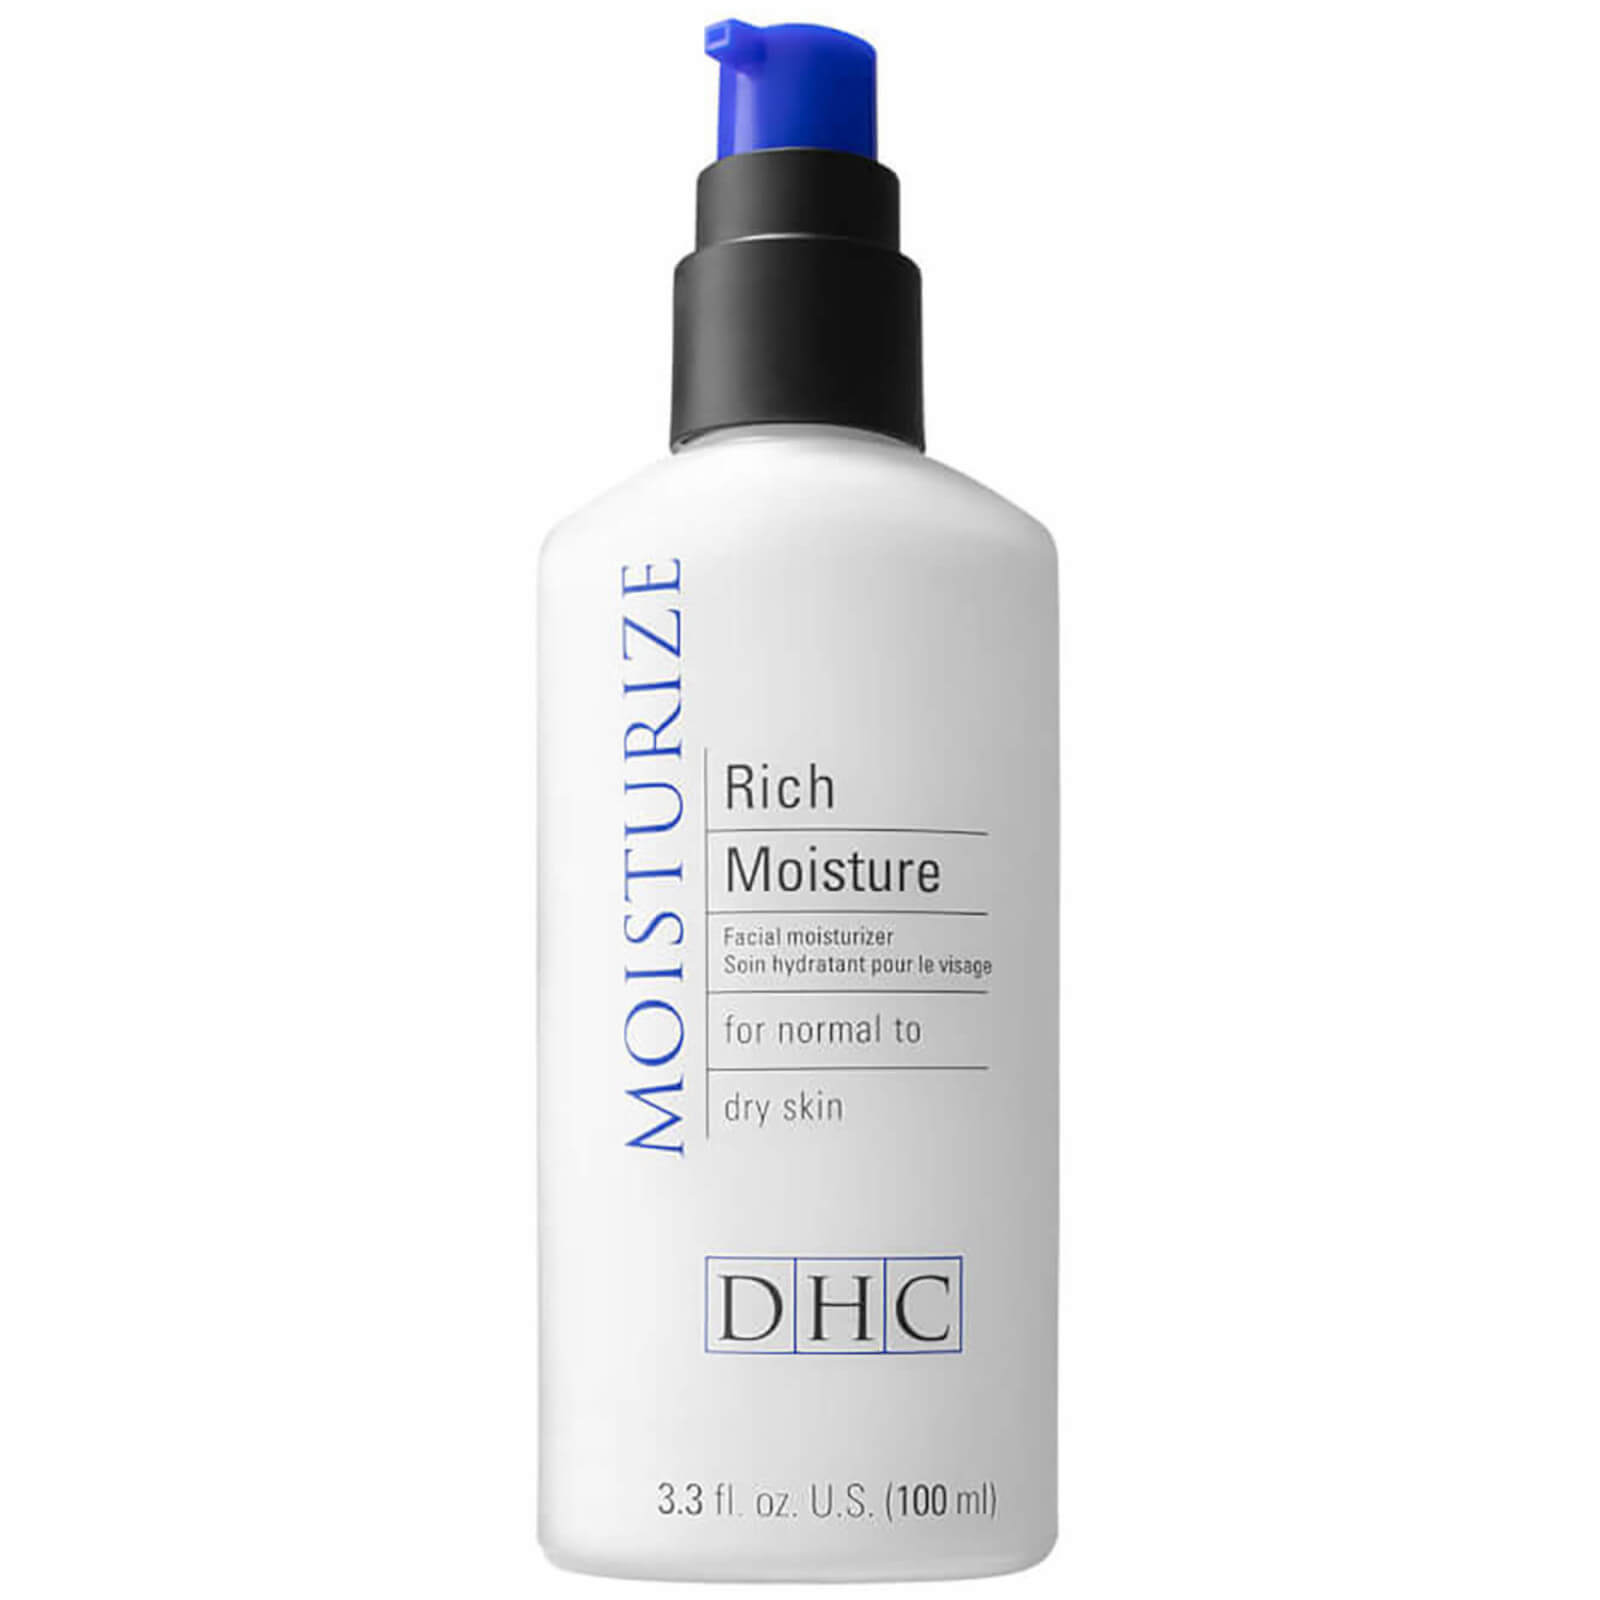 Купить DHC Rich Moisture Face Moisturiser (100ml)